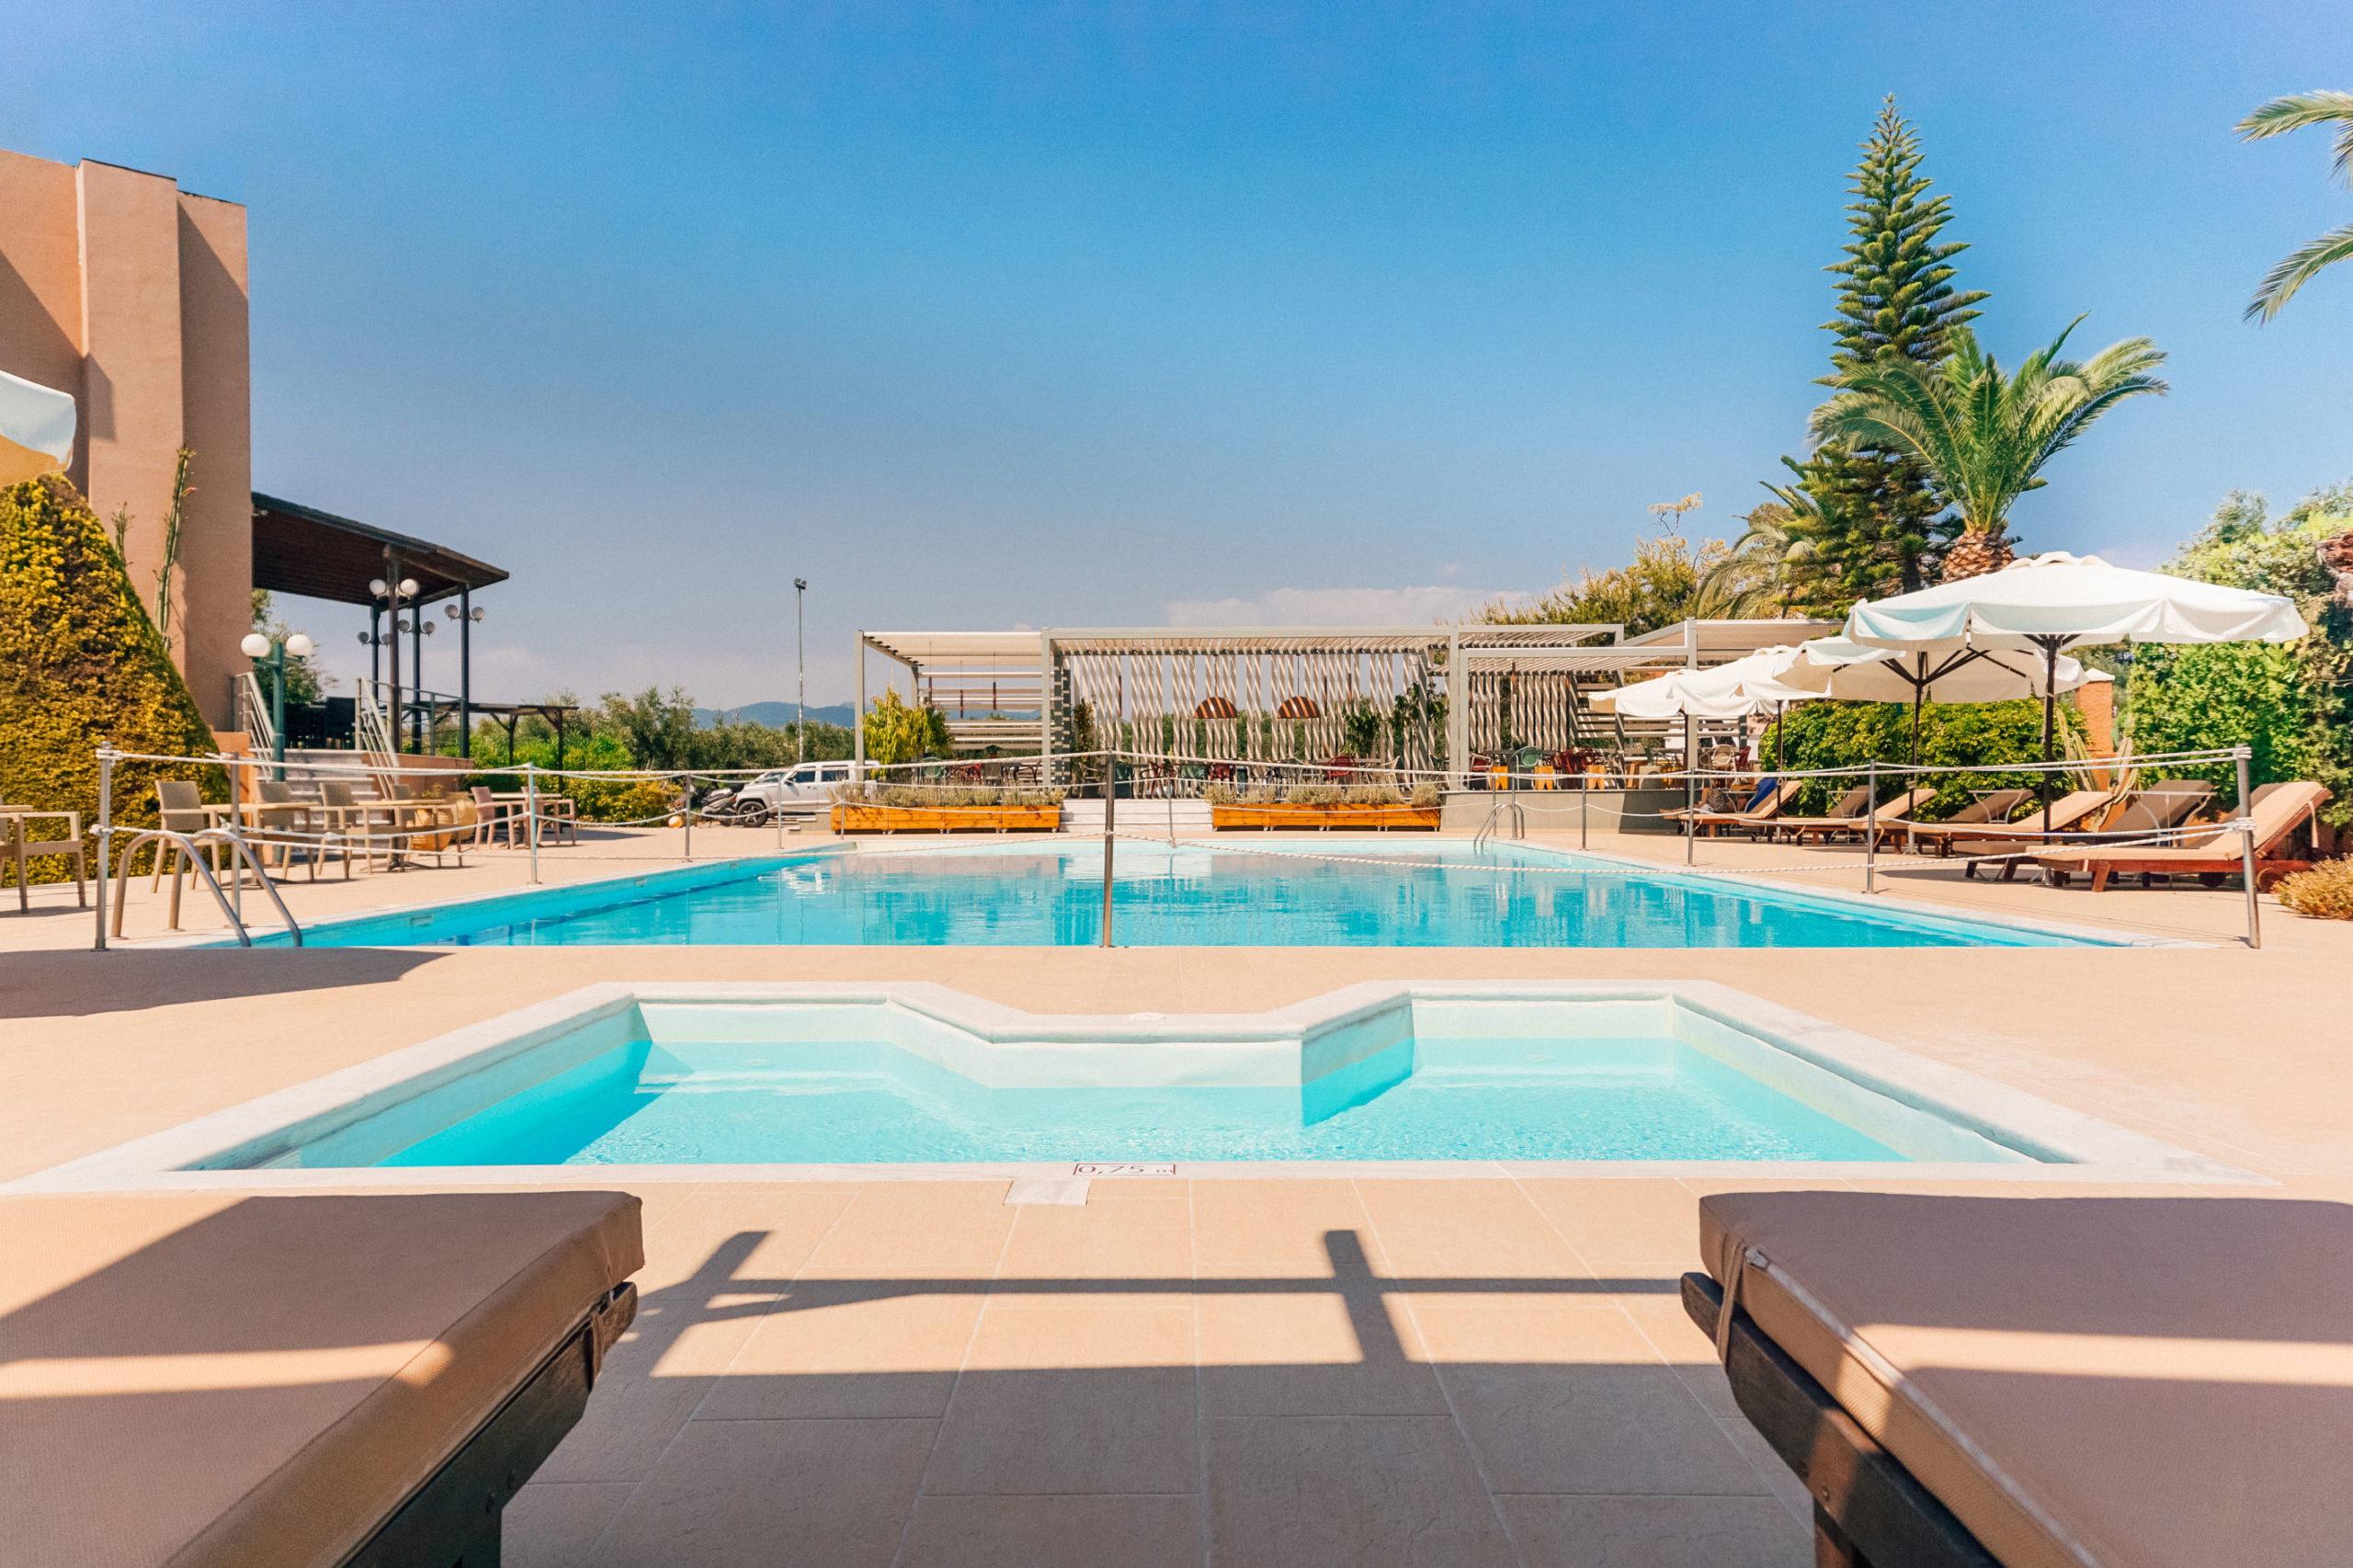 Apollo Resort Art Hotel